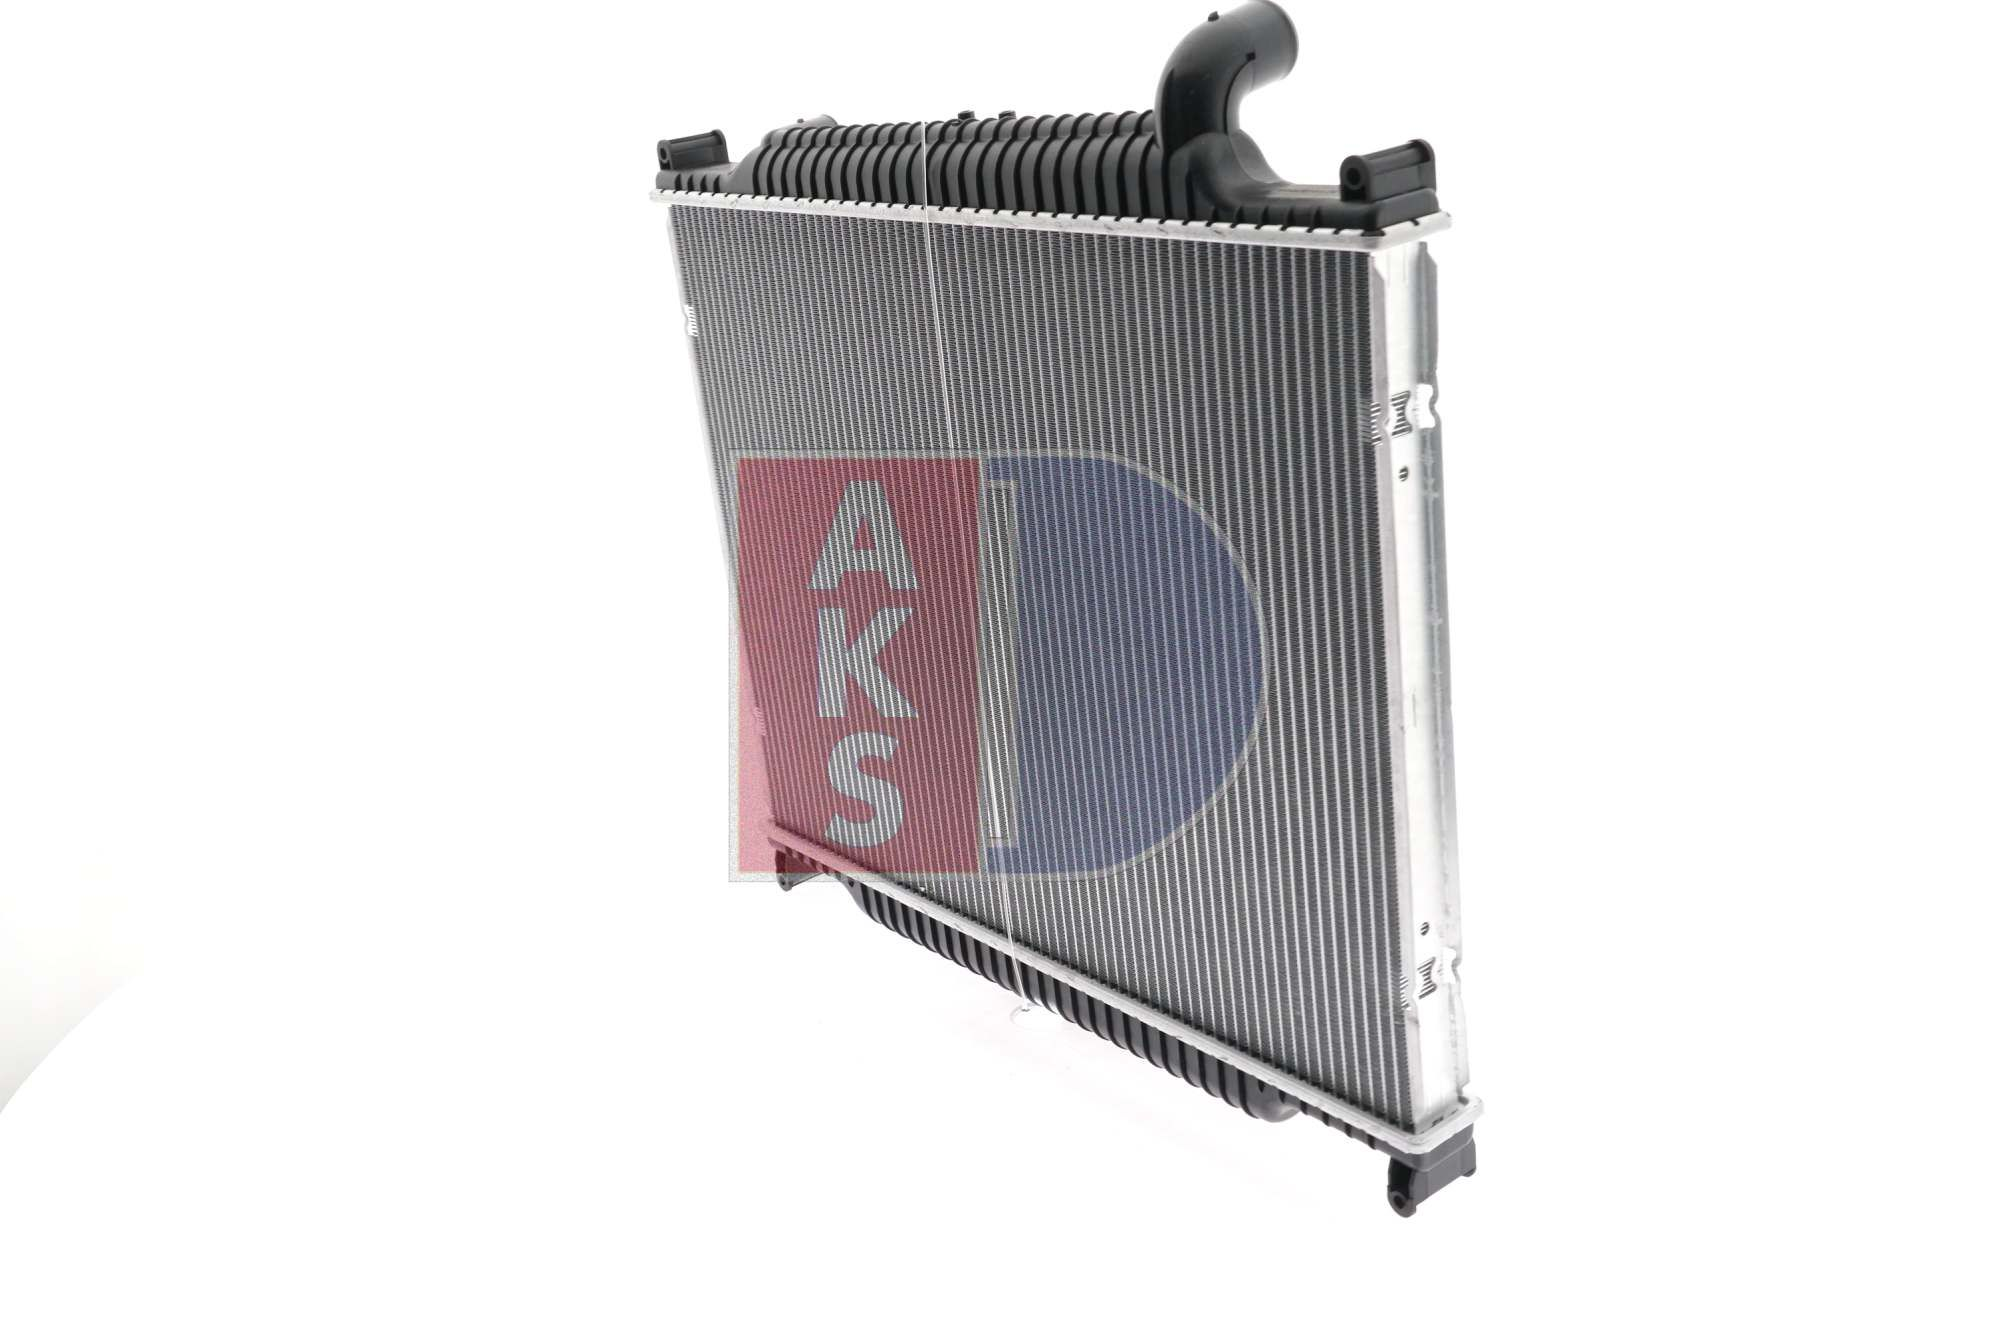 020023N Kühler AKS DASIS - Markenprodukte billig